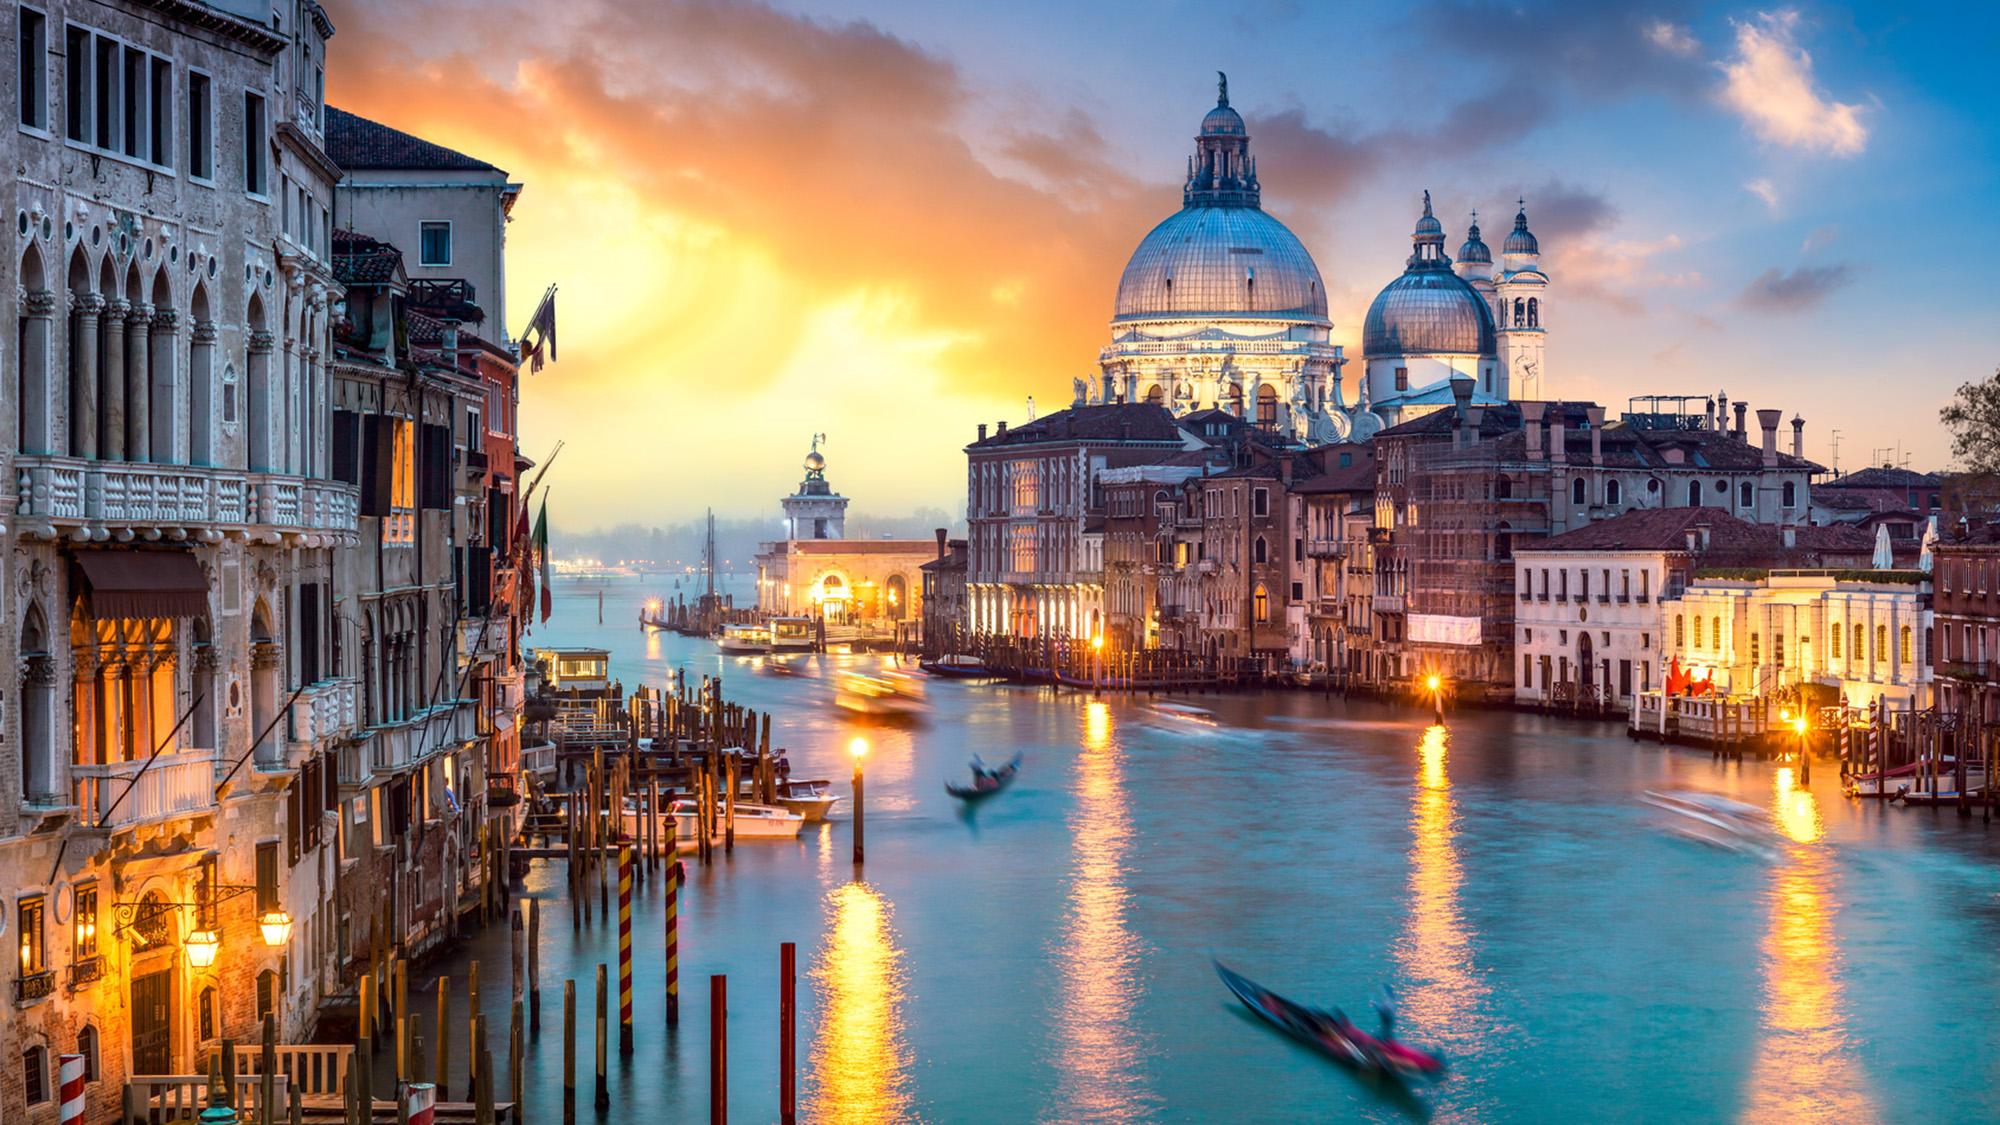 Venedig bei Sonnenuntergang